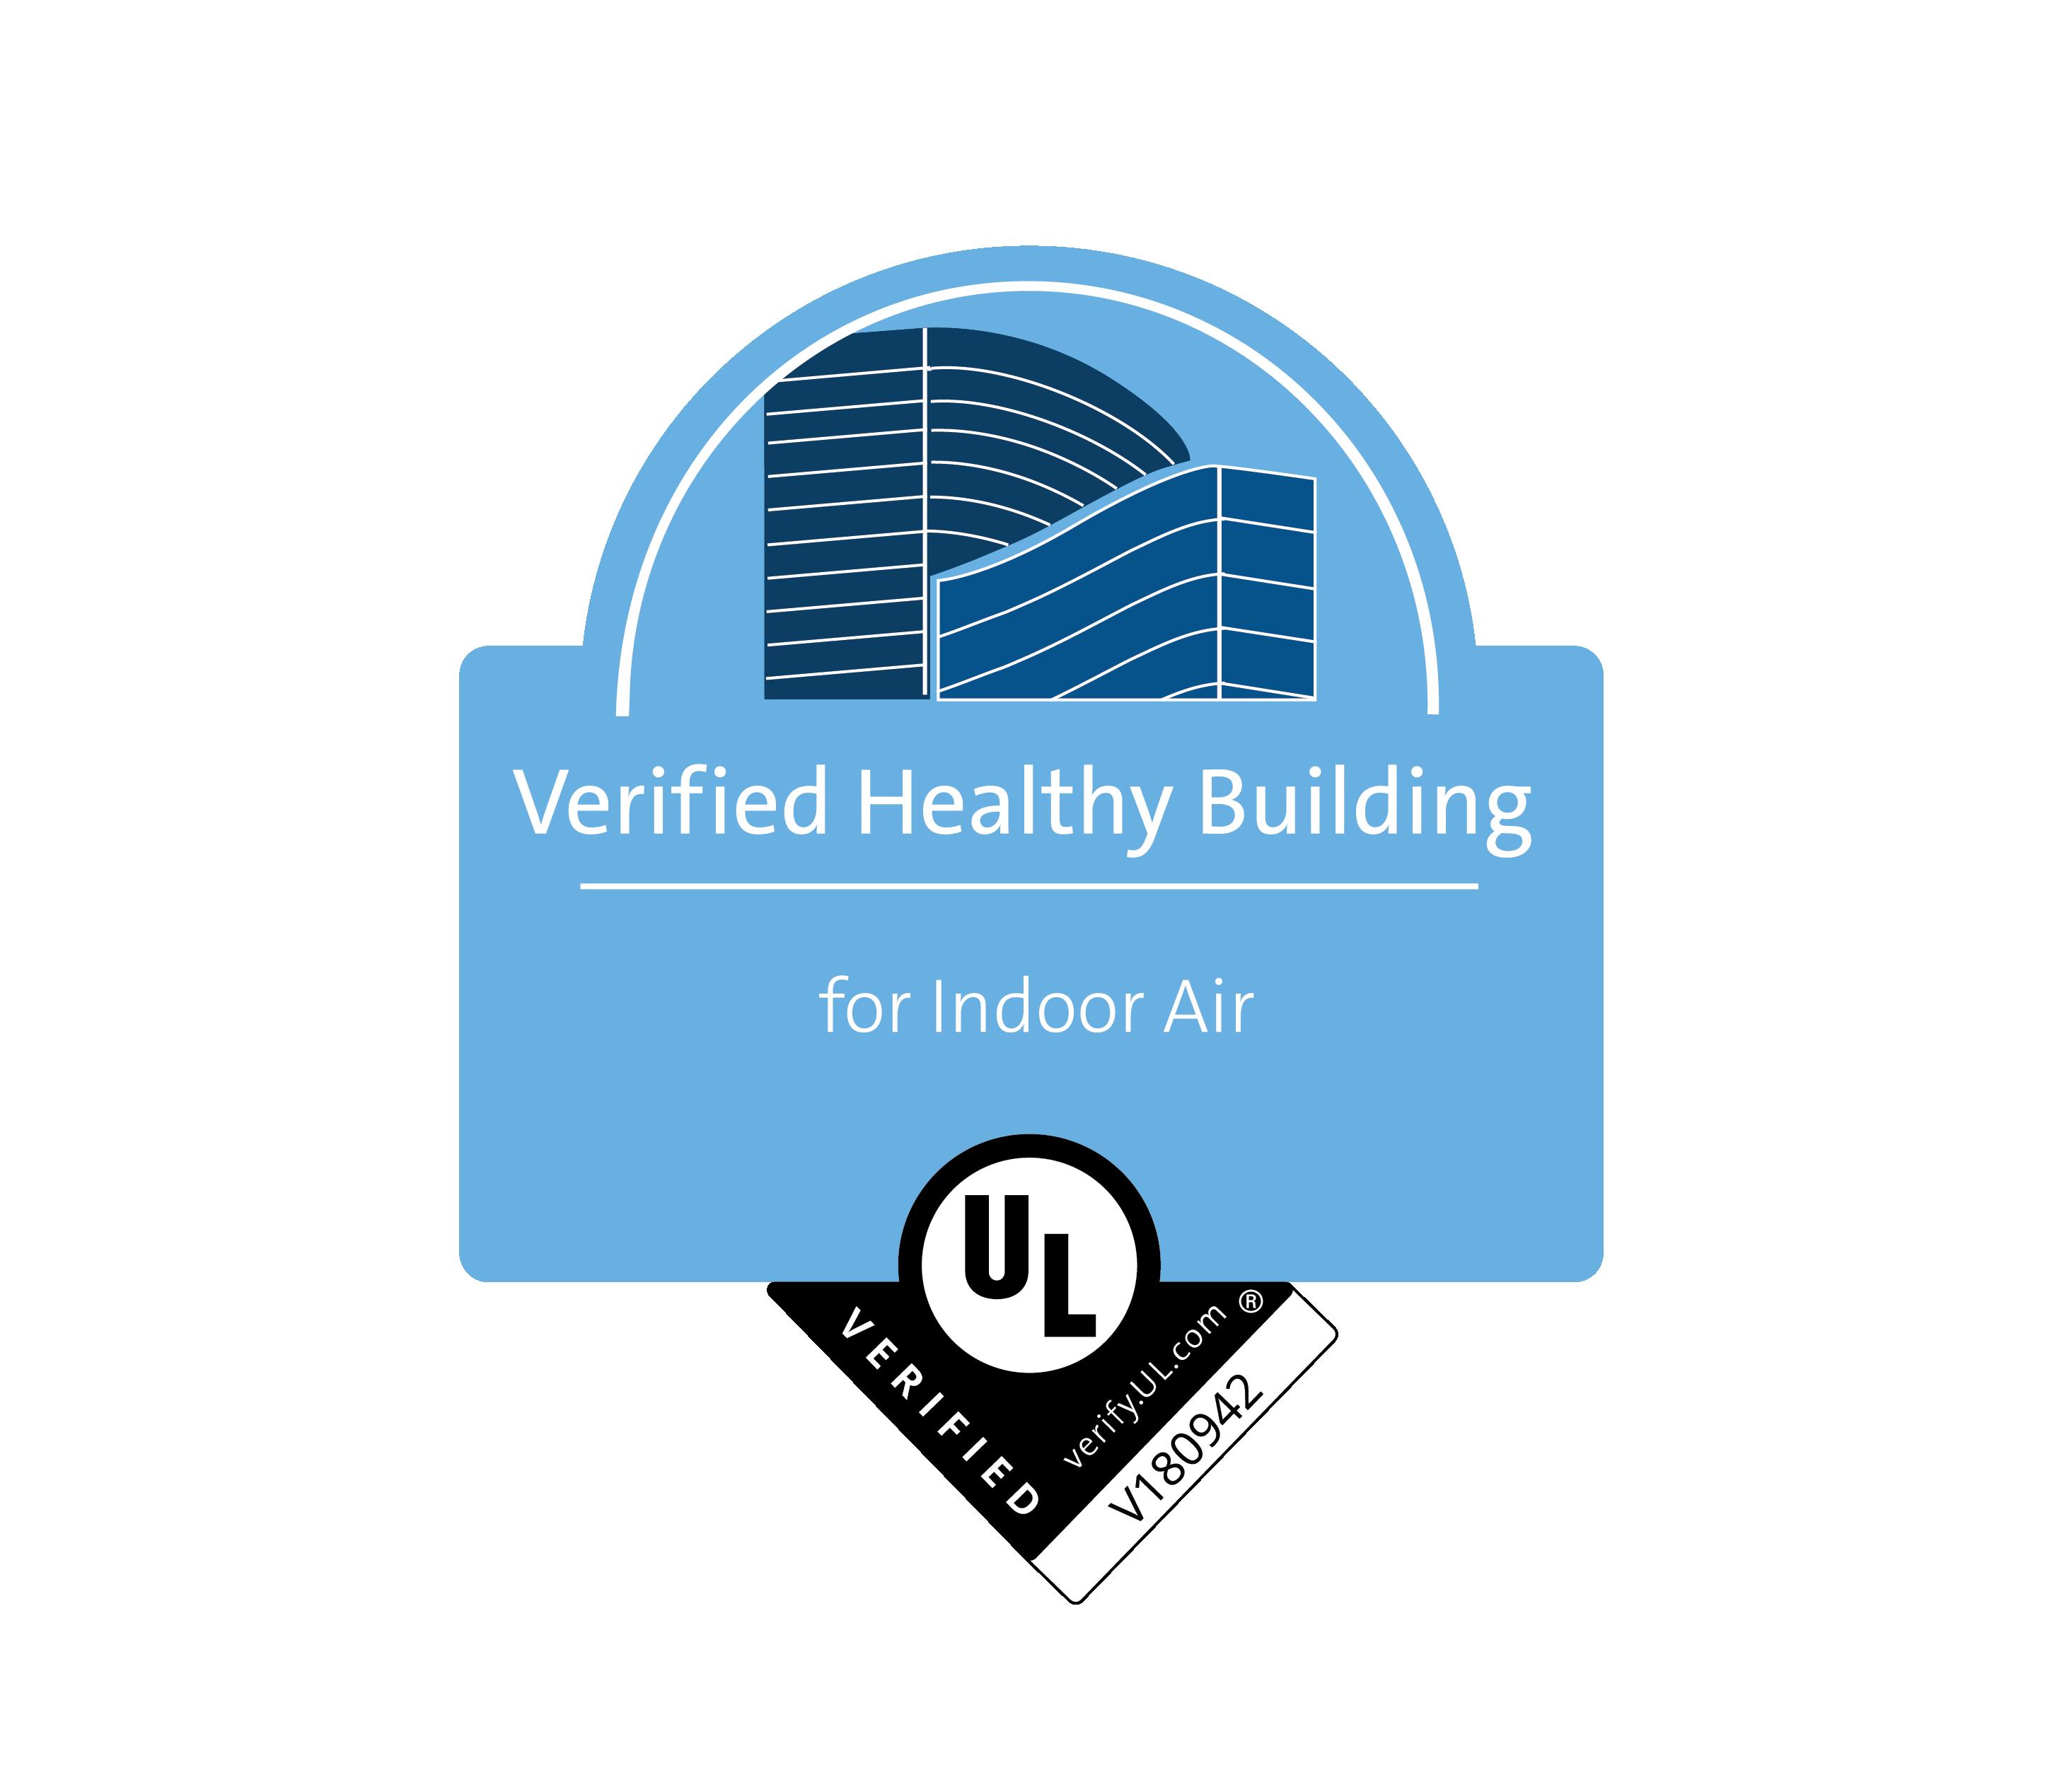 UL Indoor Air verified